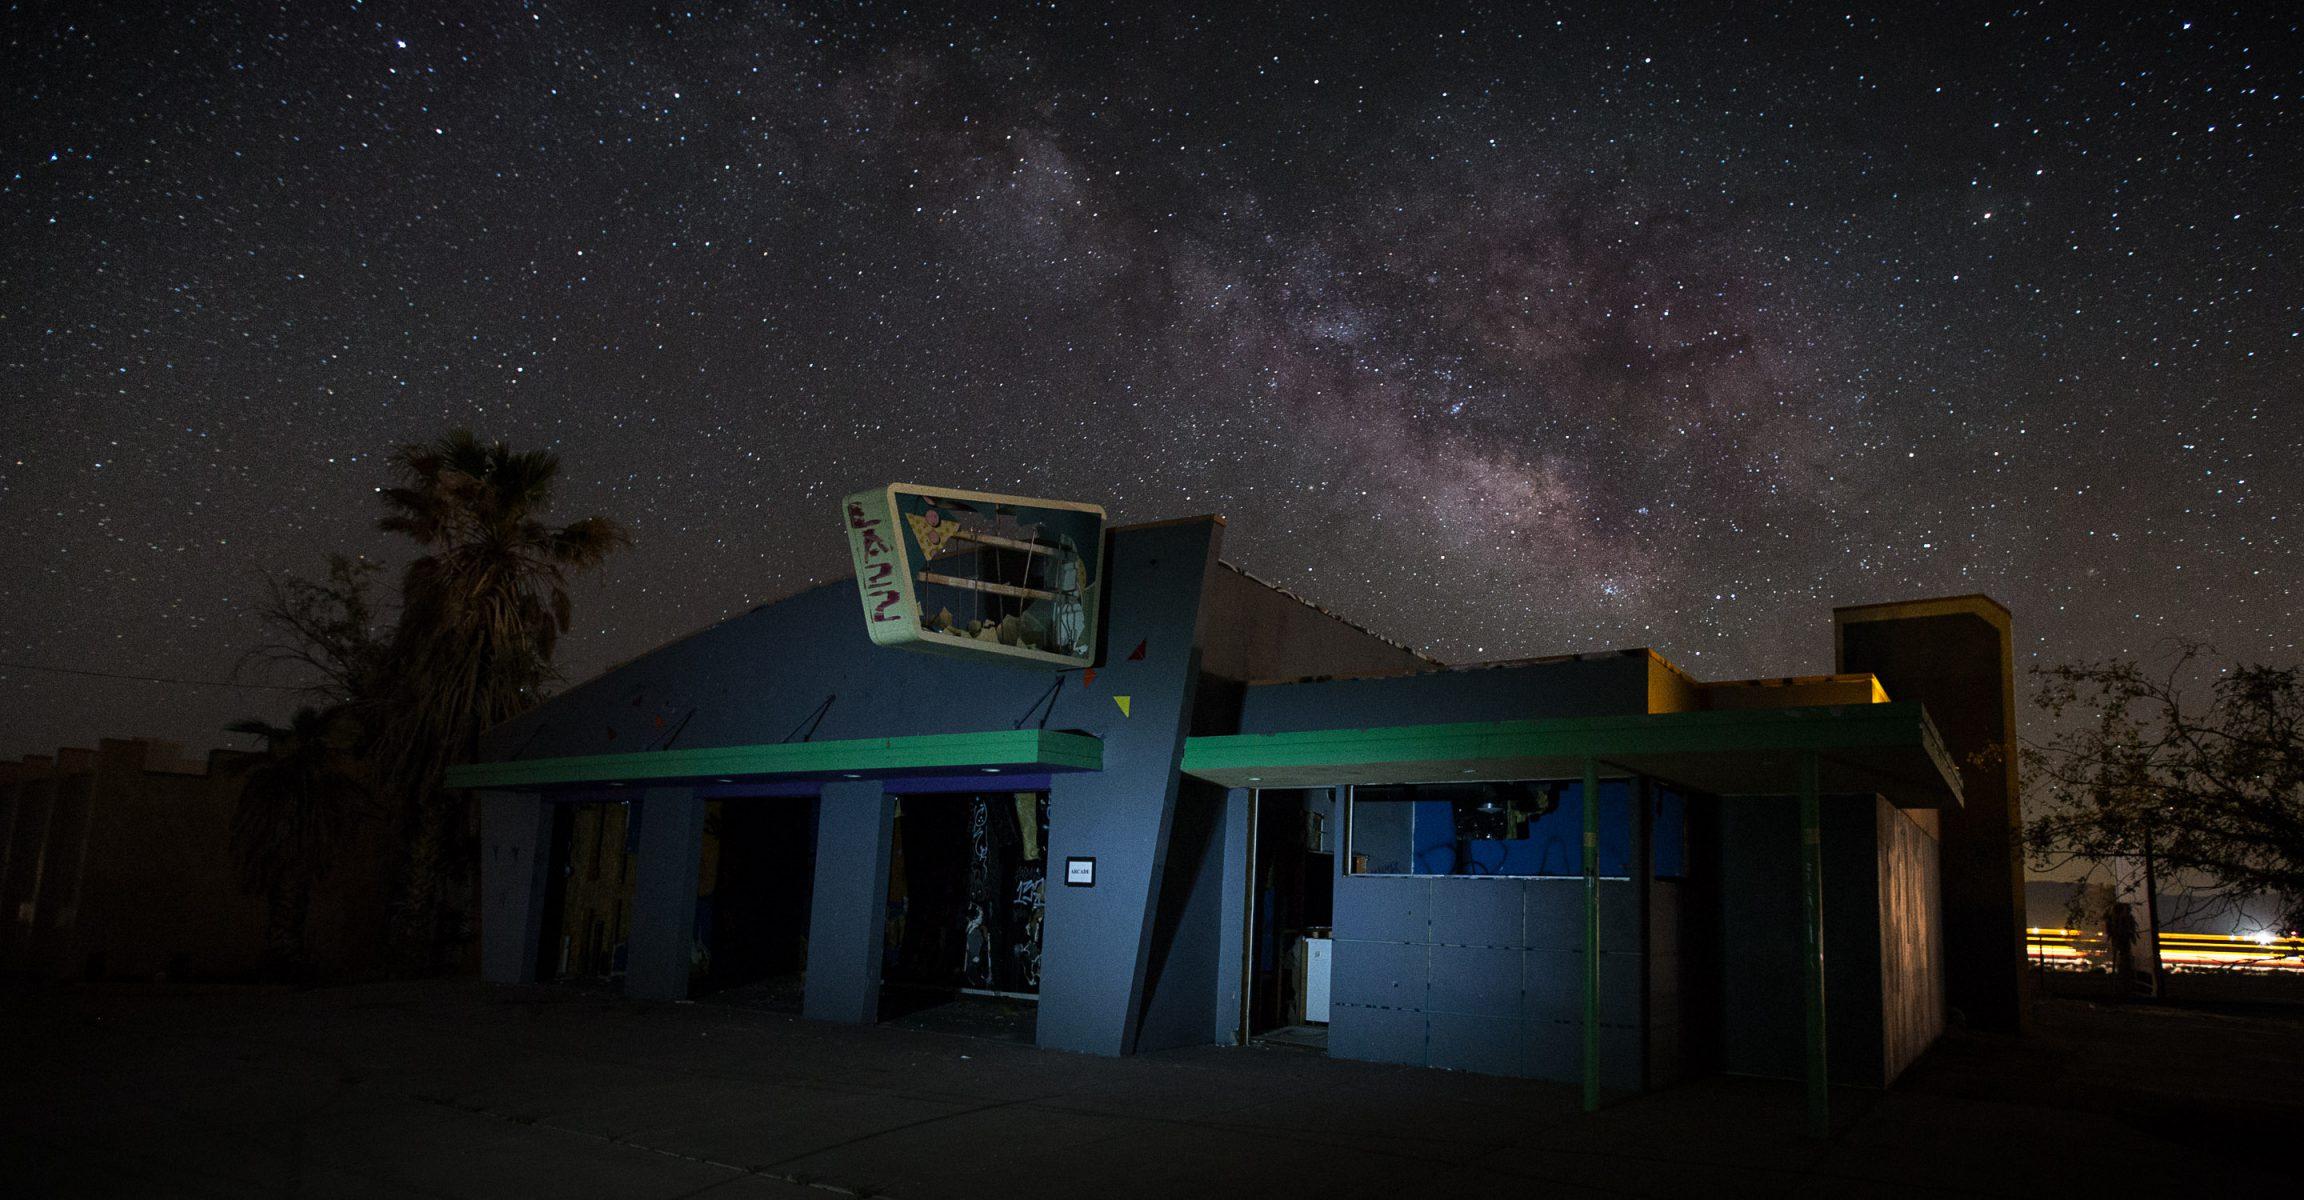 rock a hole waterpark, abandoned, barstow, california, i-15